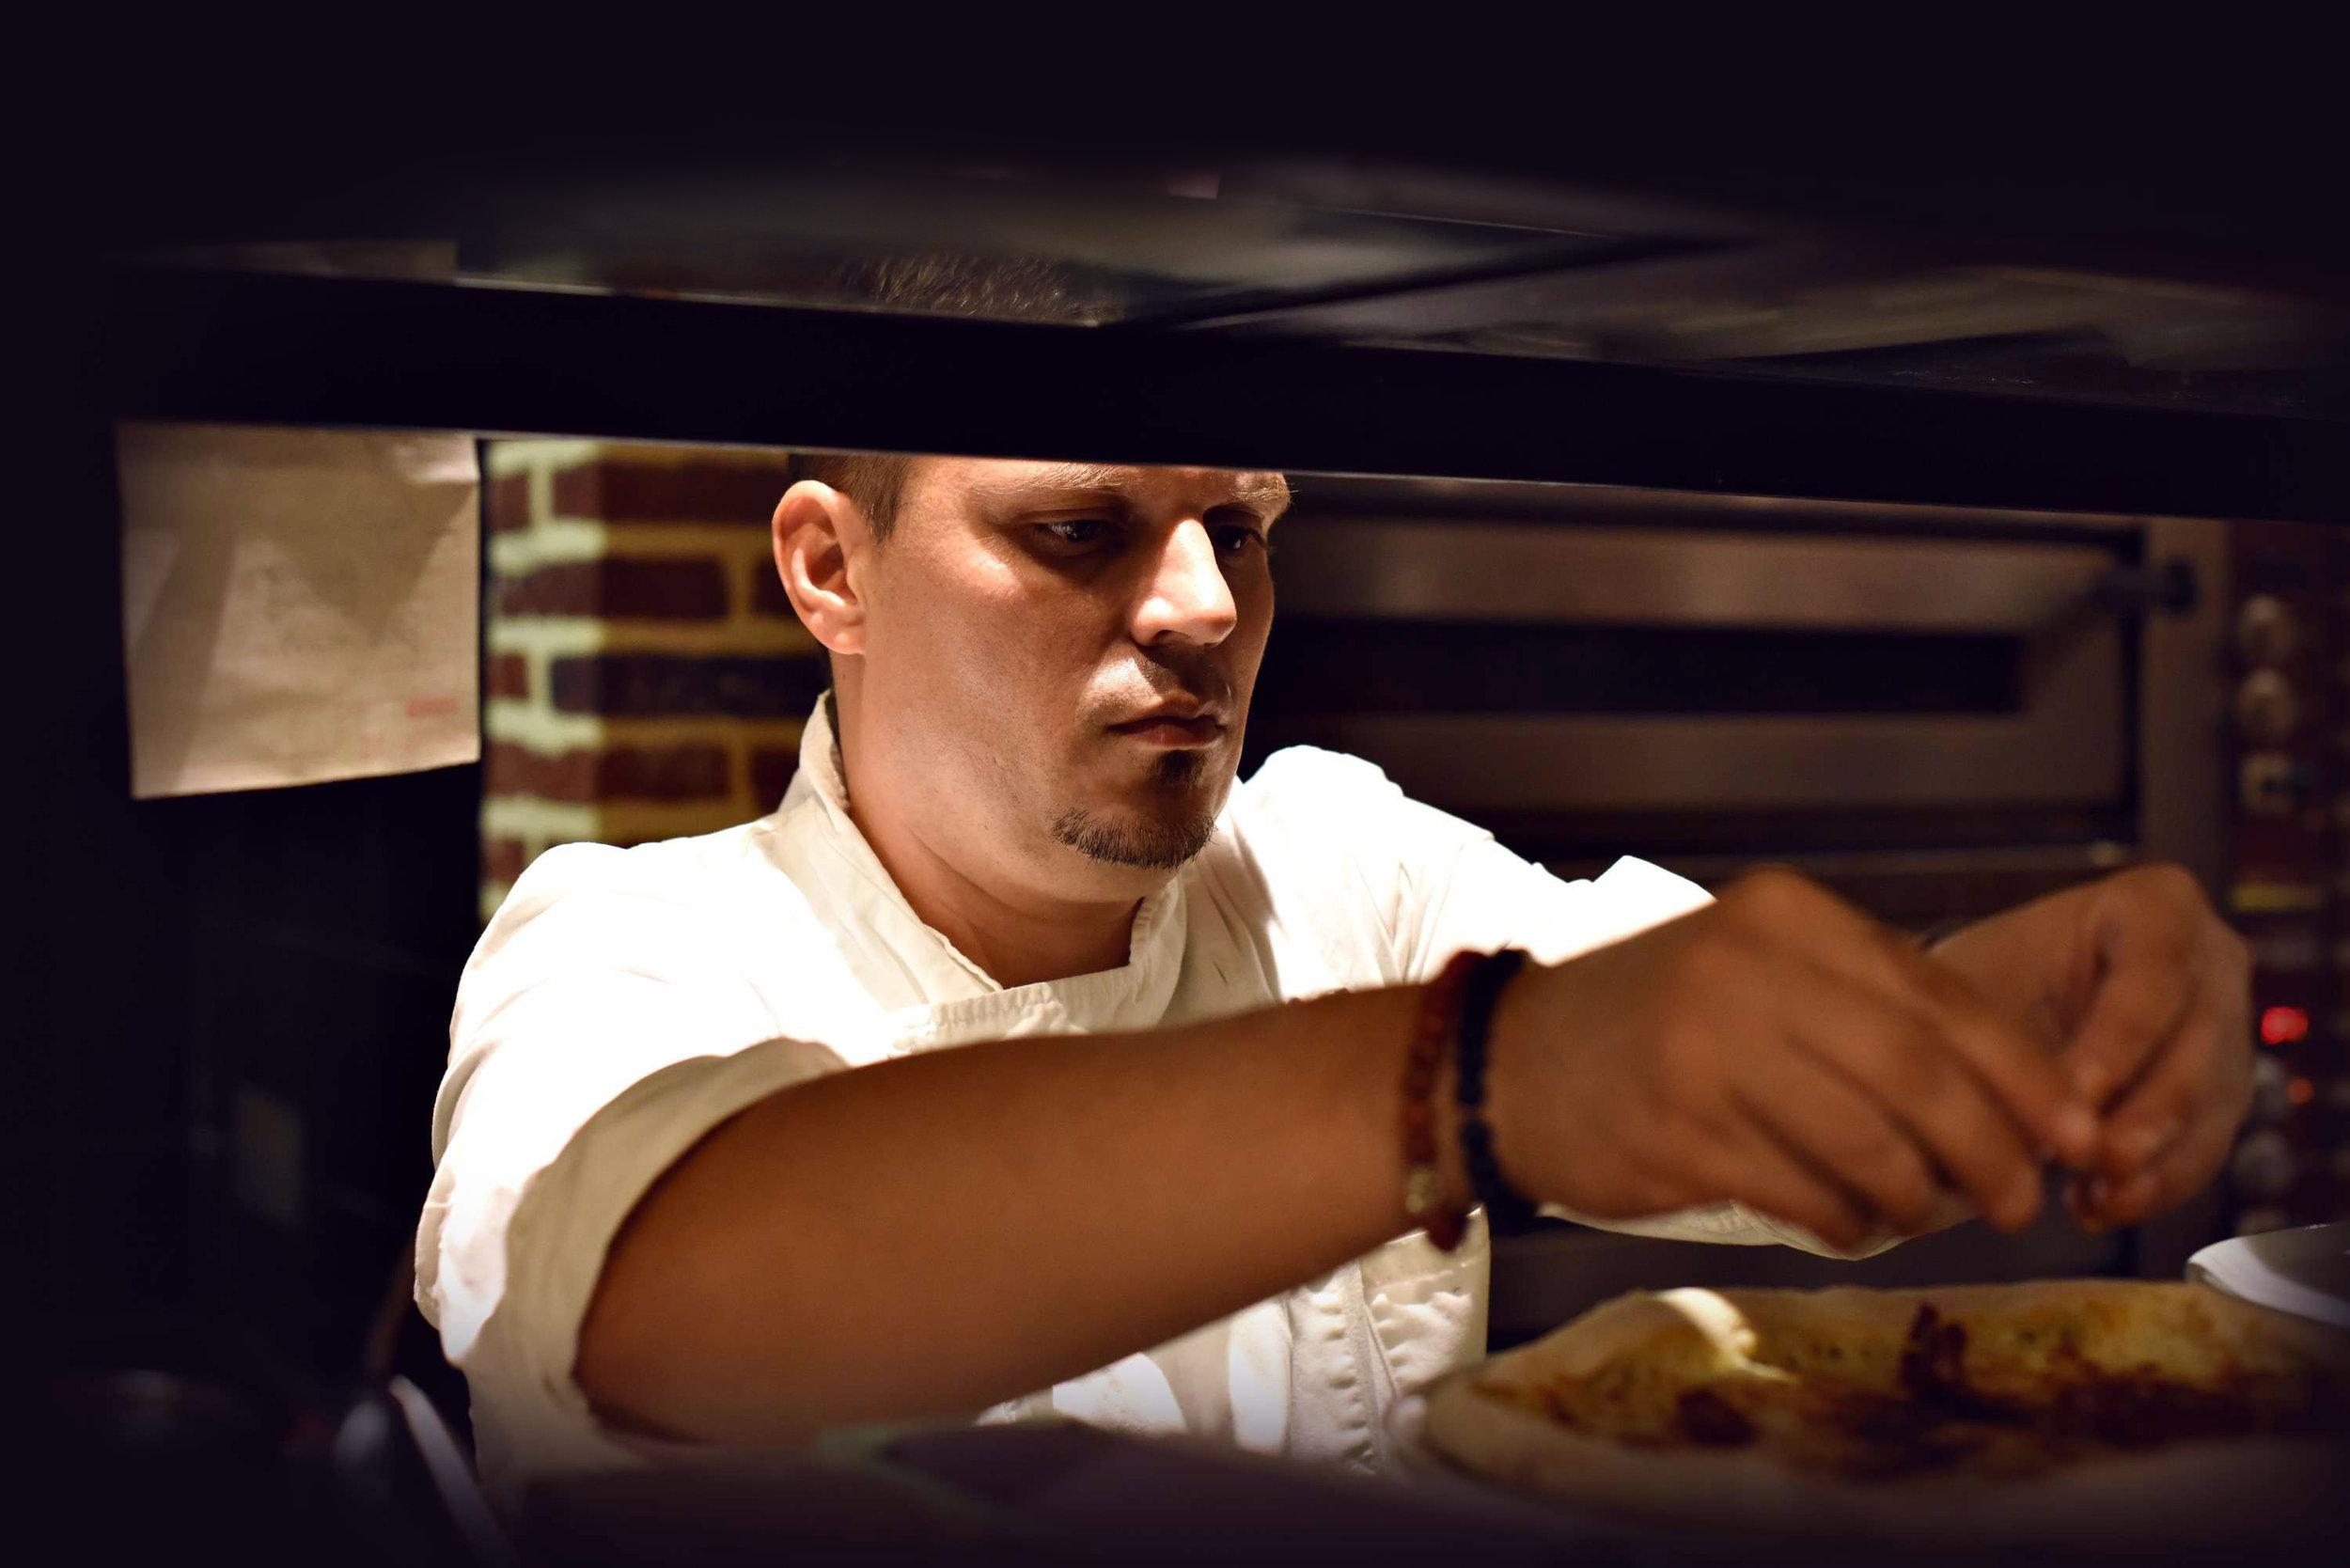 15 la filosofia leuven italiaans restaurant italie bart albrecht tablefever.jpg